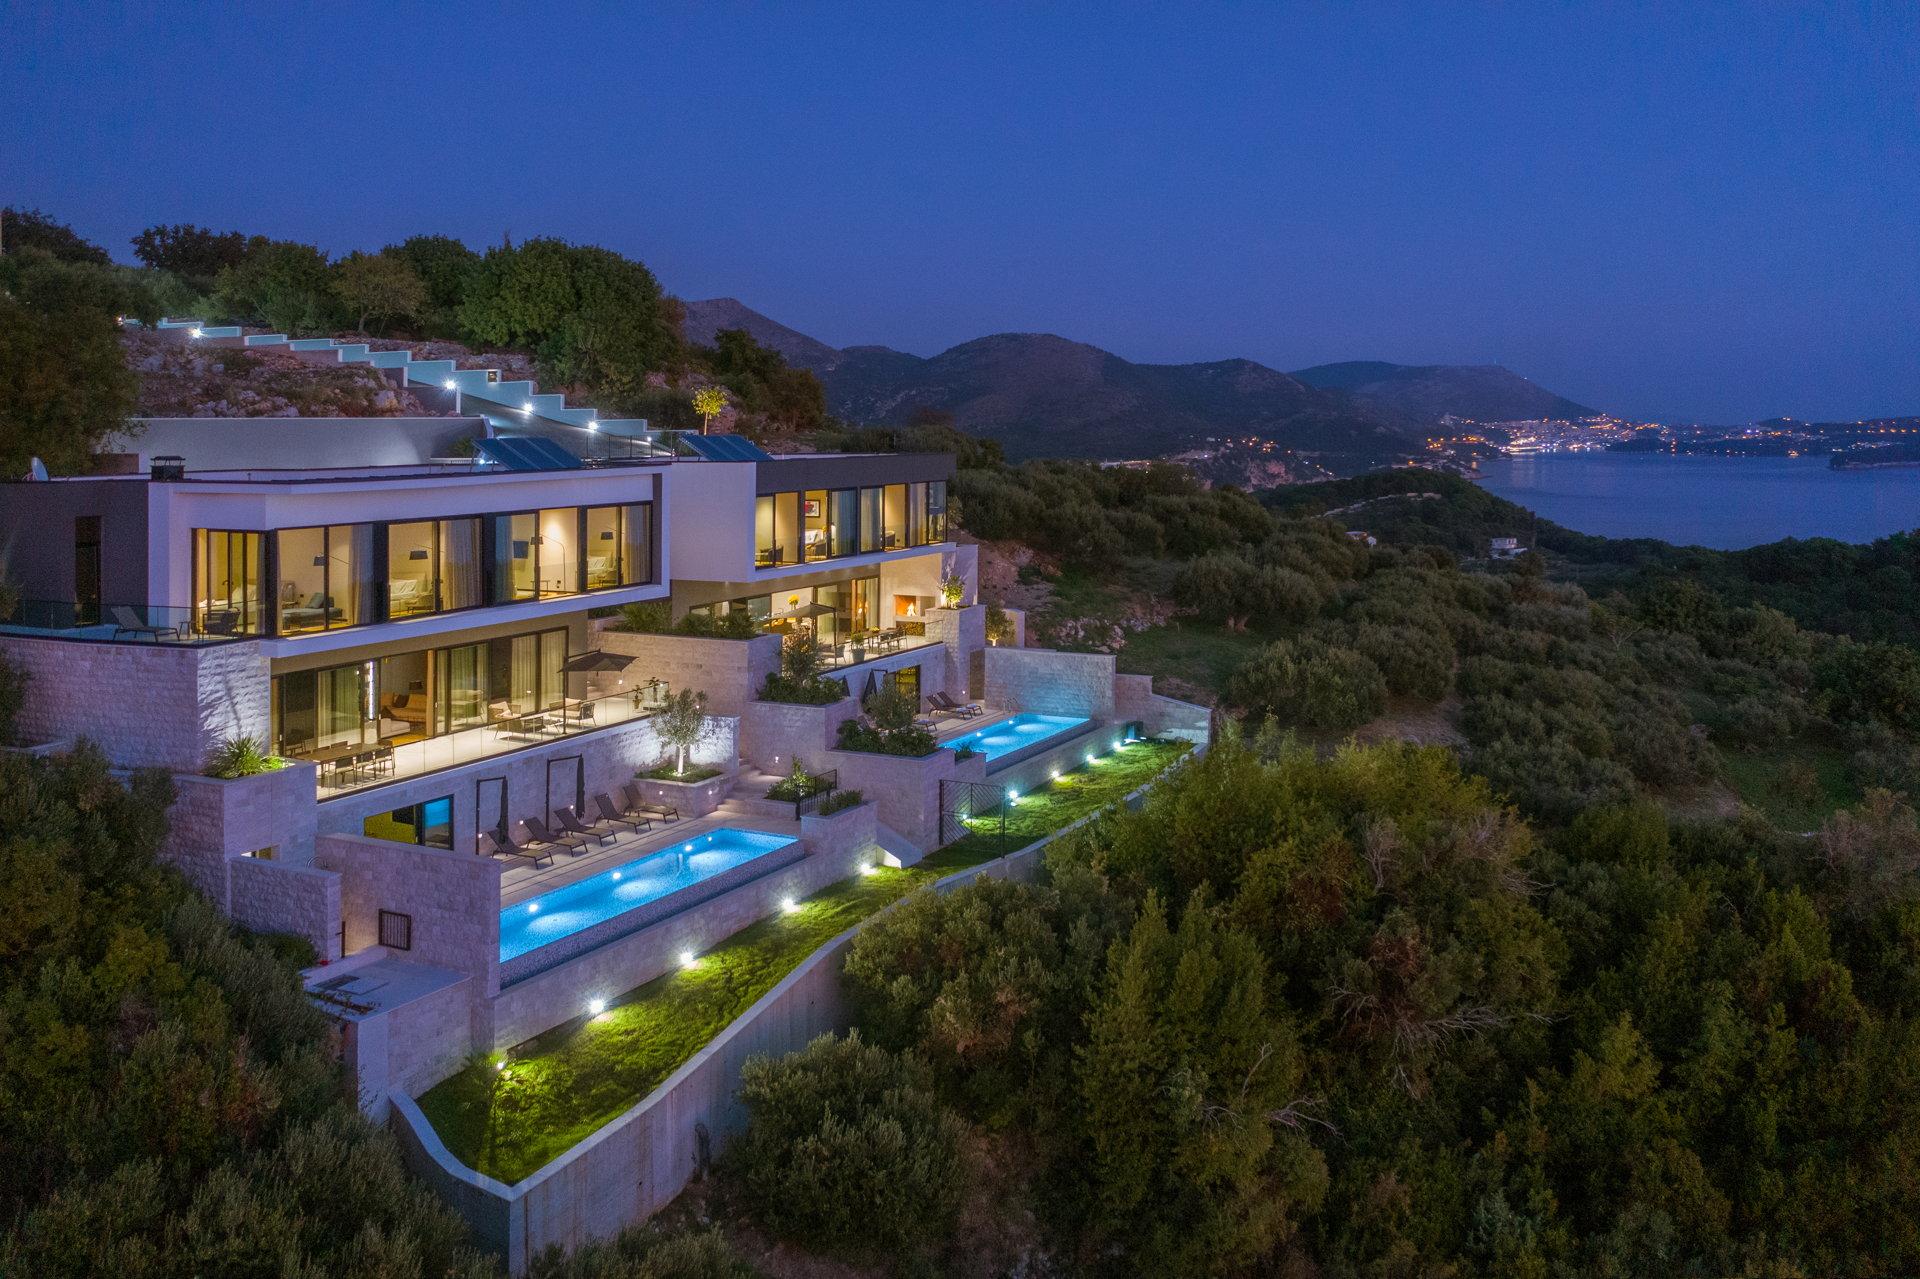 Large Luxury Villa for Rent in Croatia - 9 bedroom villa Dubrovnik Sisters with 2 infinty pools near Dubrovnik